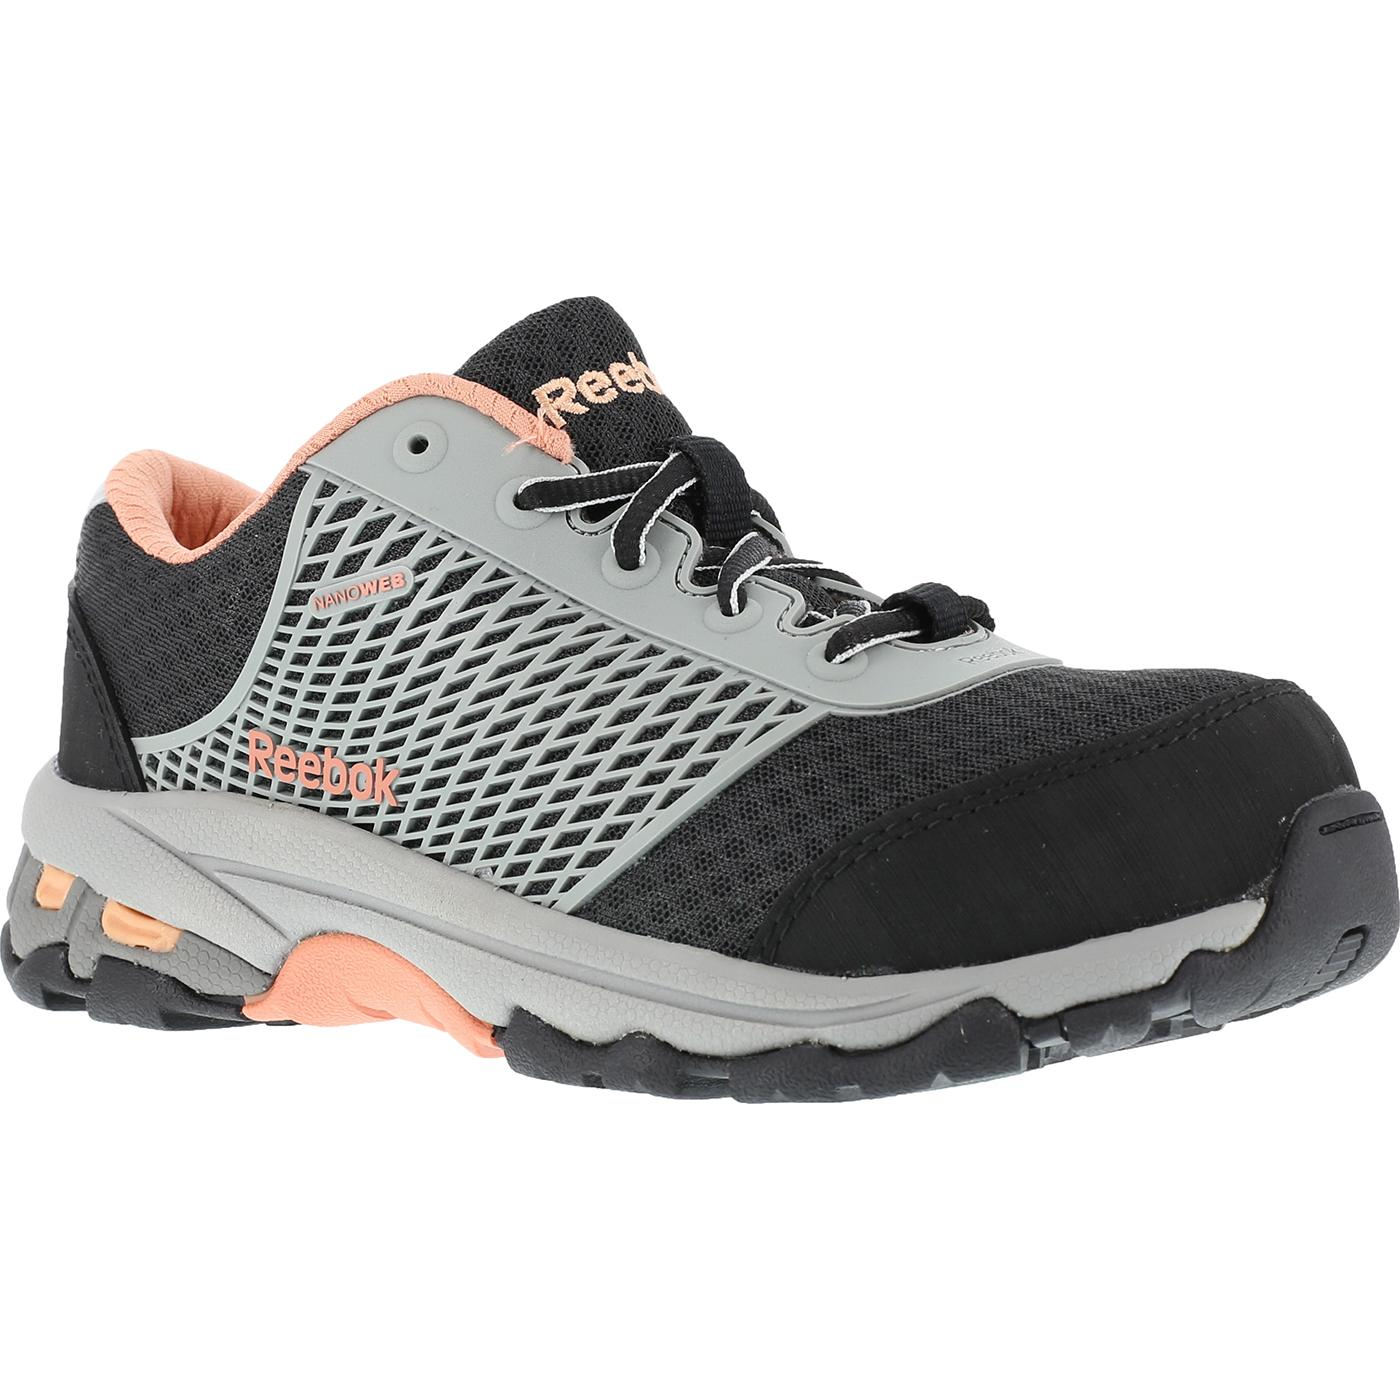 Reebok Heckler Women s Composite Toe Work Athletic ShoeReebok Heckler Women s  Composite Toe Work Athletic Shoe a290c2f92